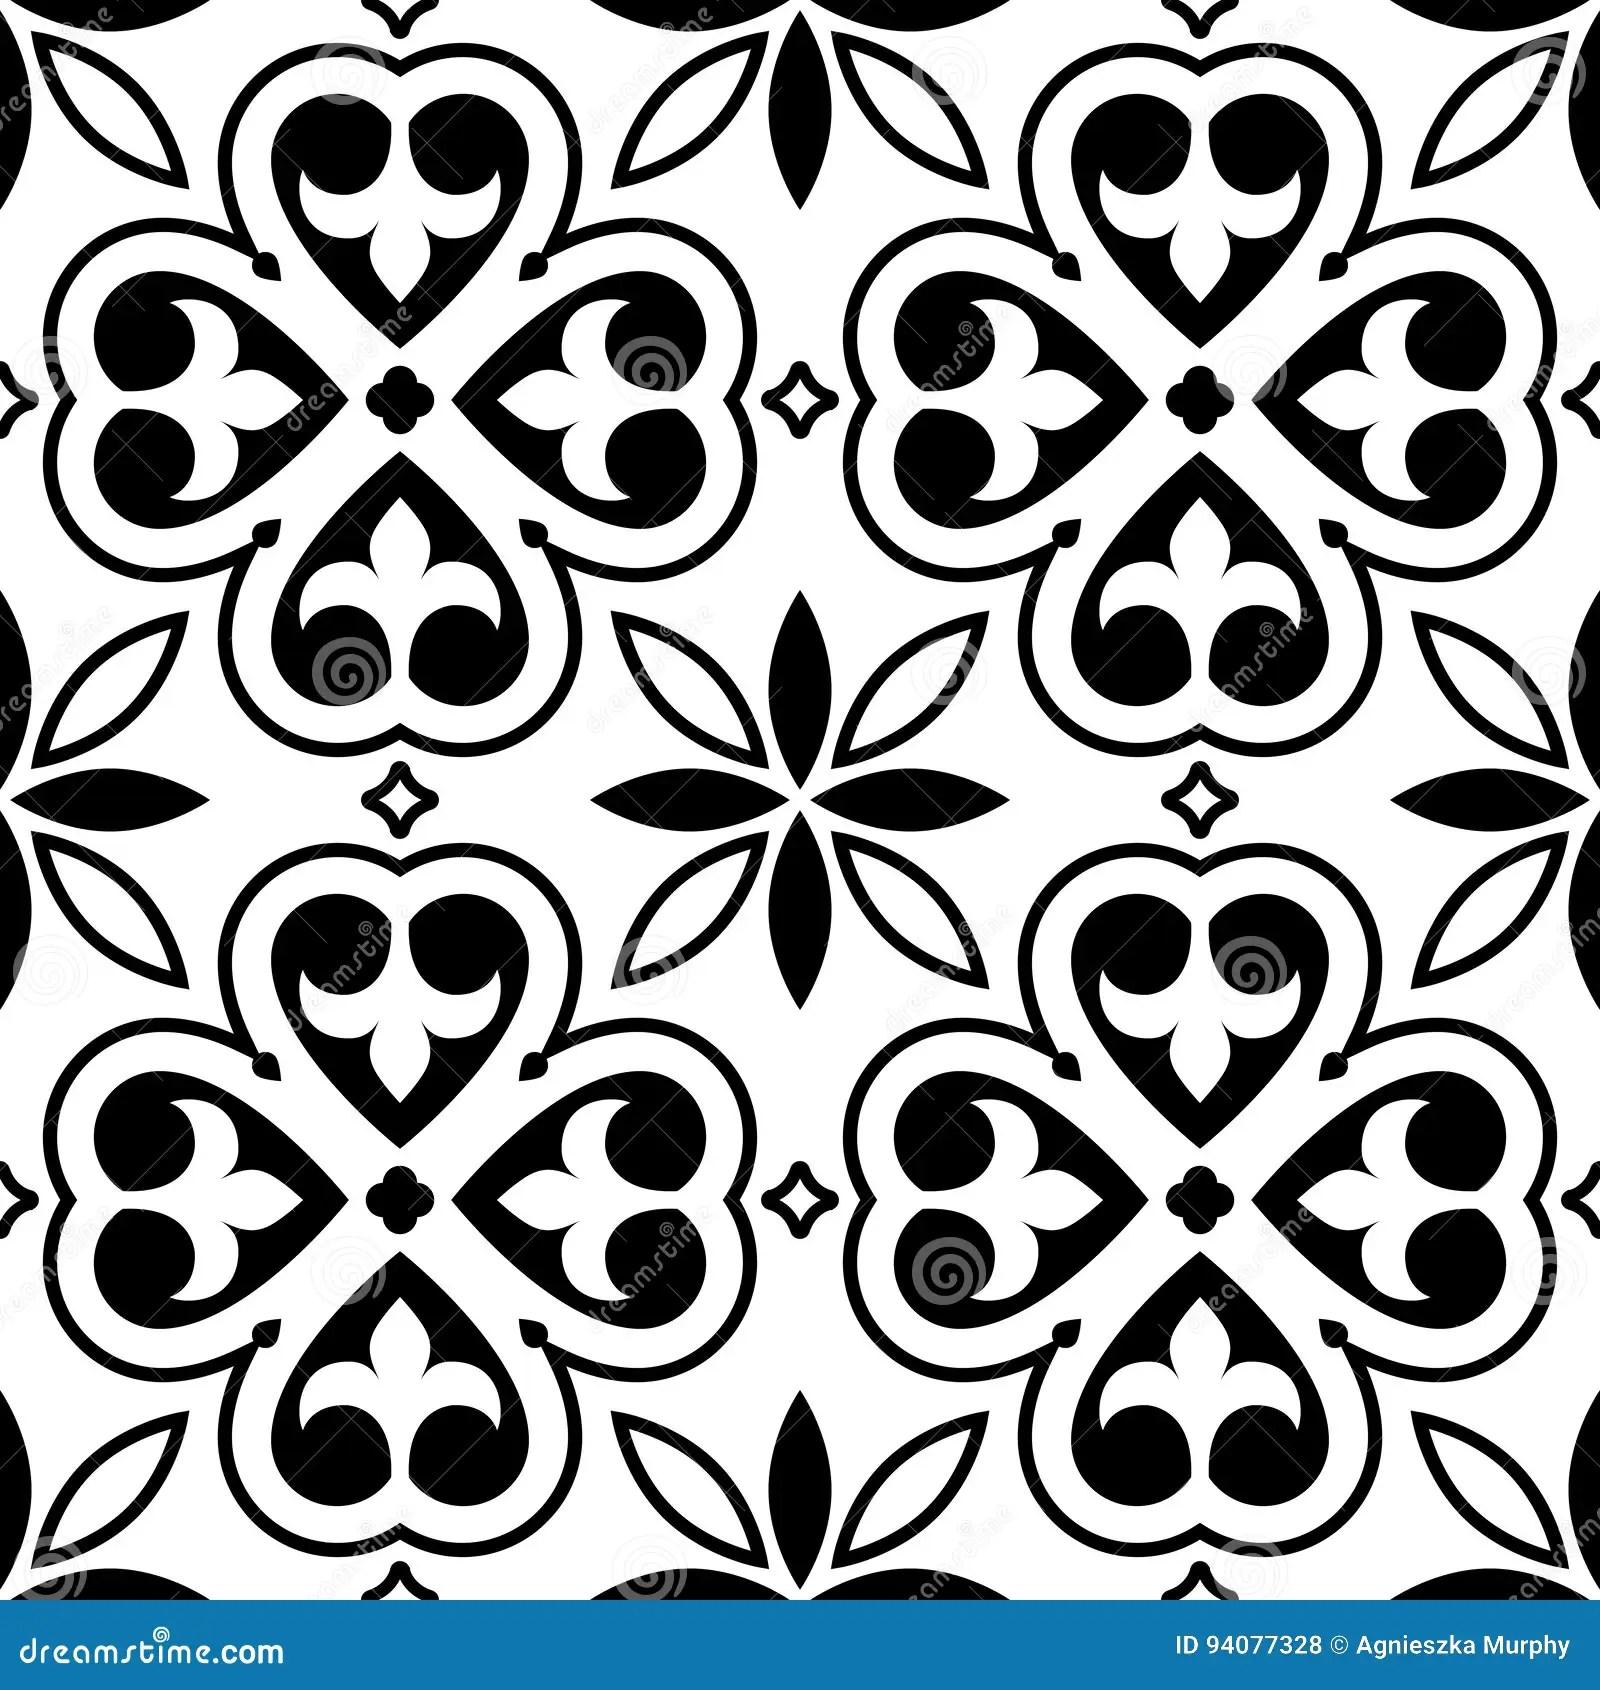 Spanish Tiles Pattern Moroccan Orportuguese Tile Seamless